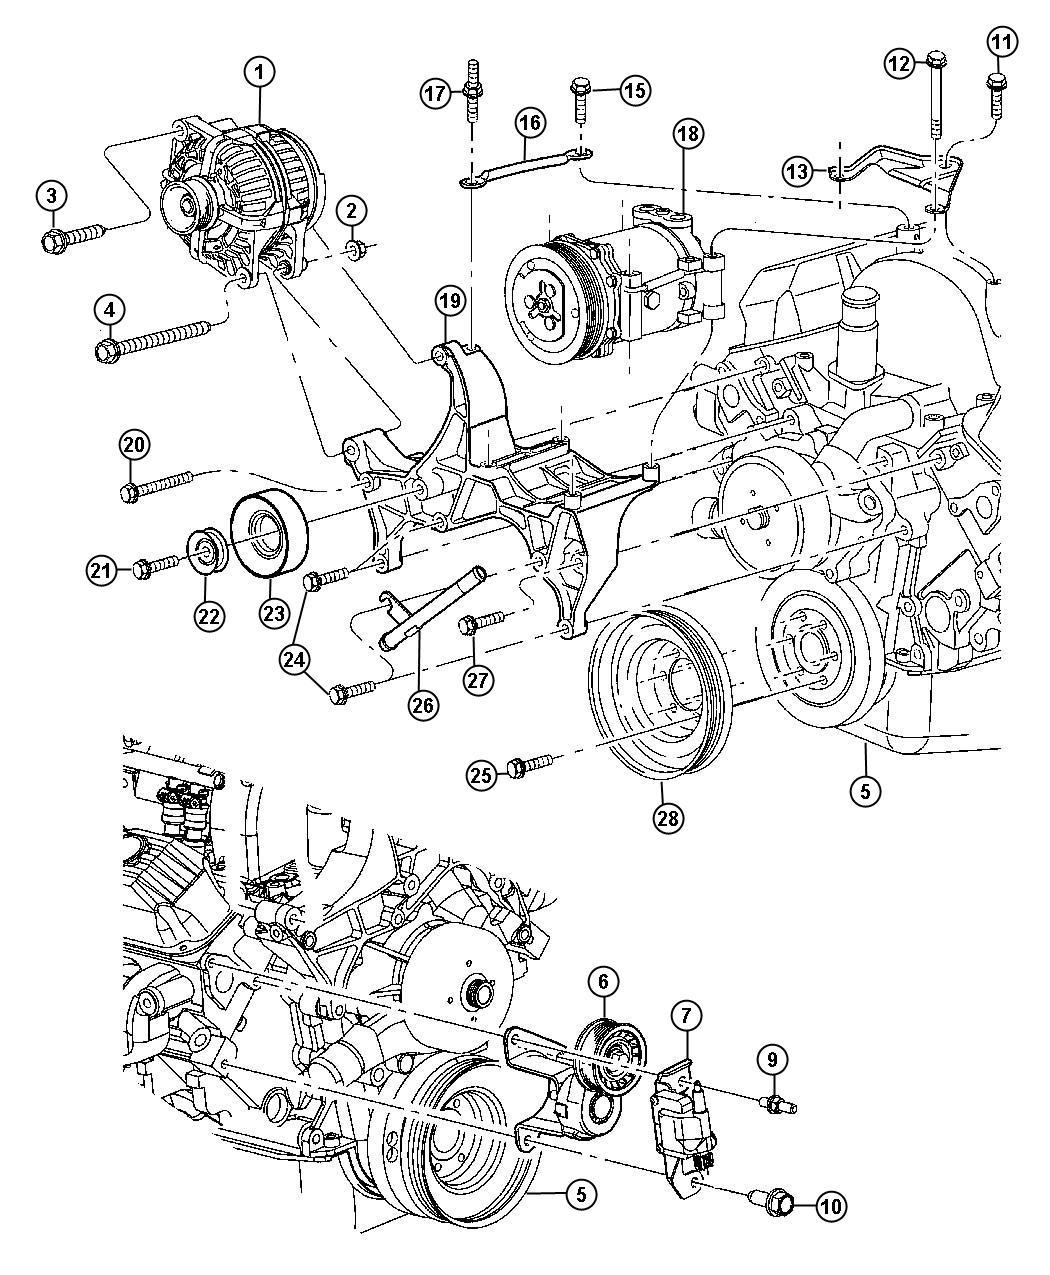 Dodge Dakota Magnum 3 9l Smpi V6 4 Spd Automatic 42re